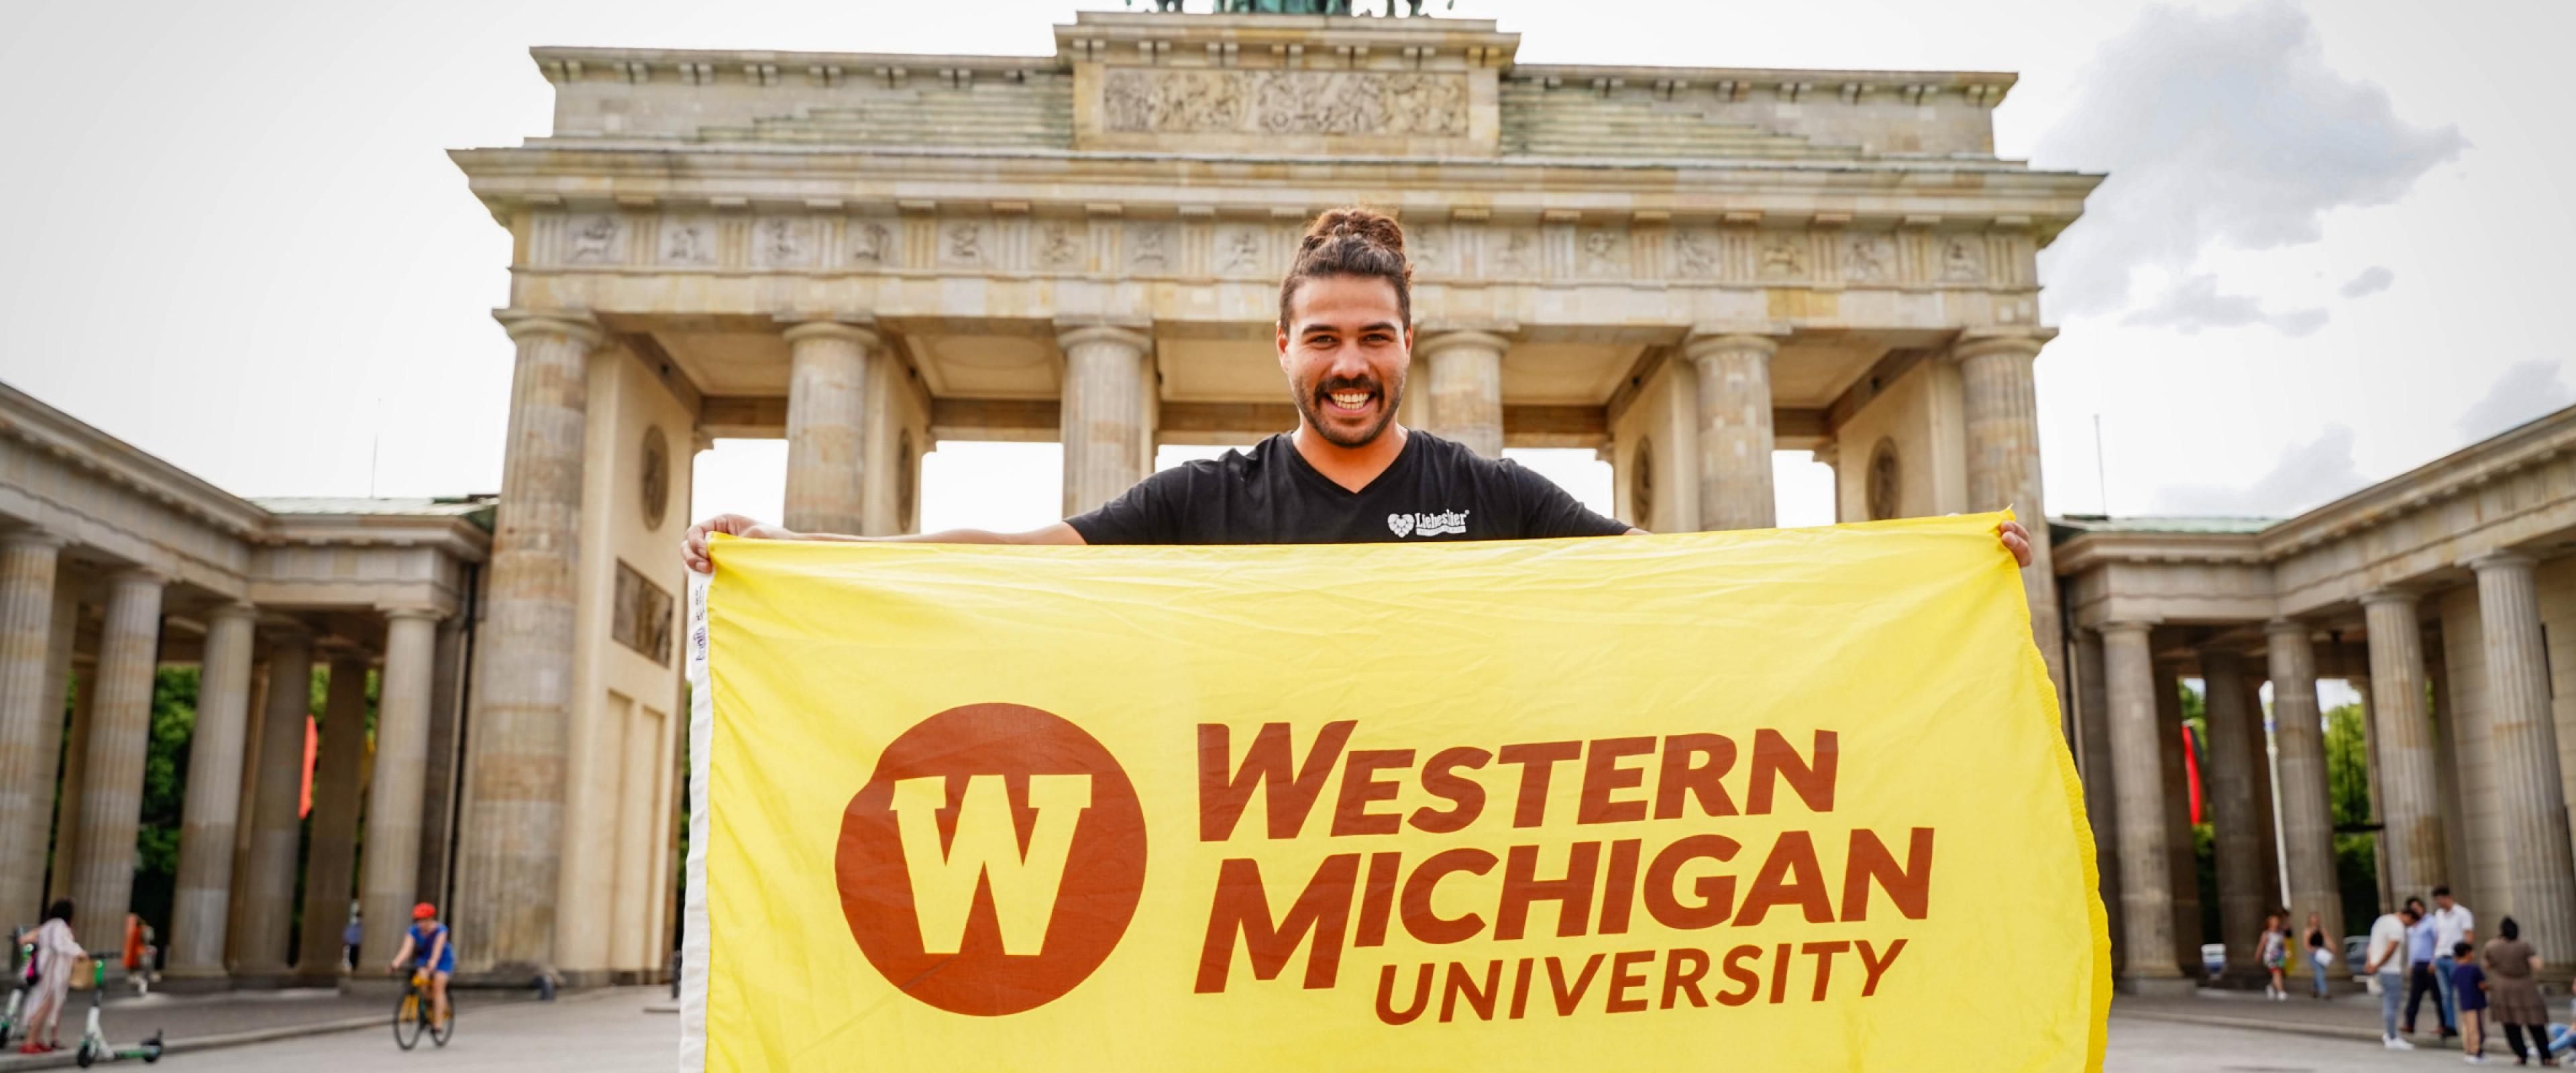 Alumnus holding W flag in Germany